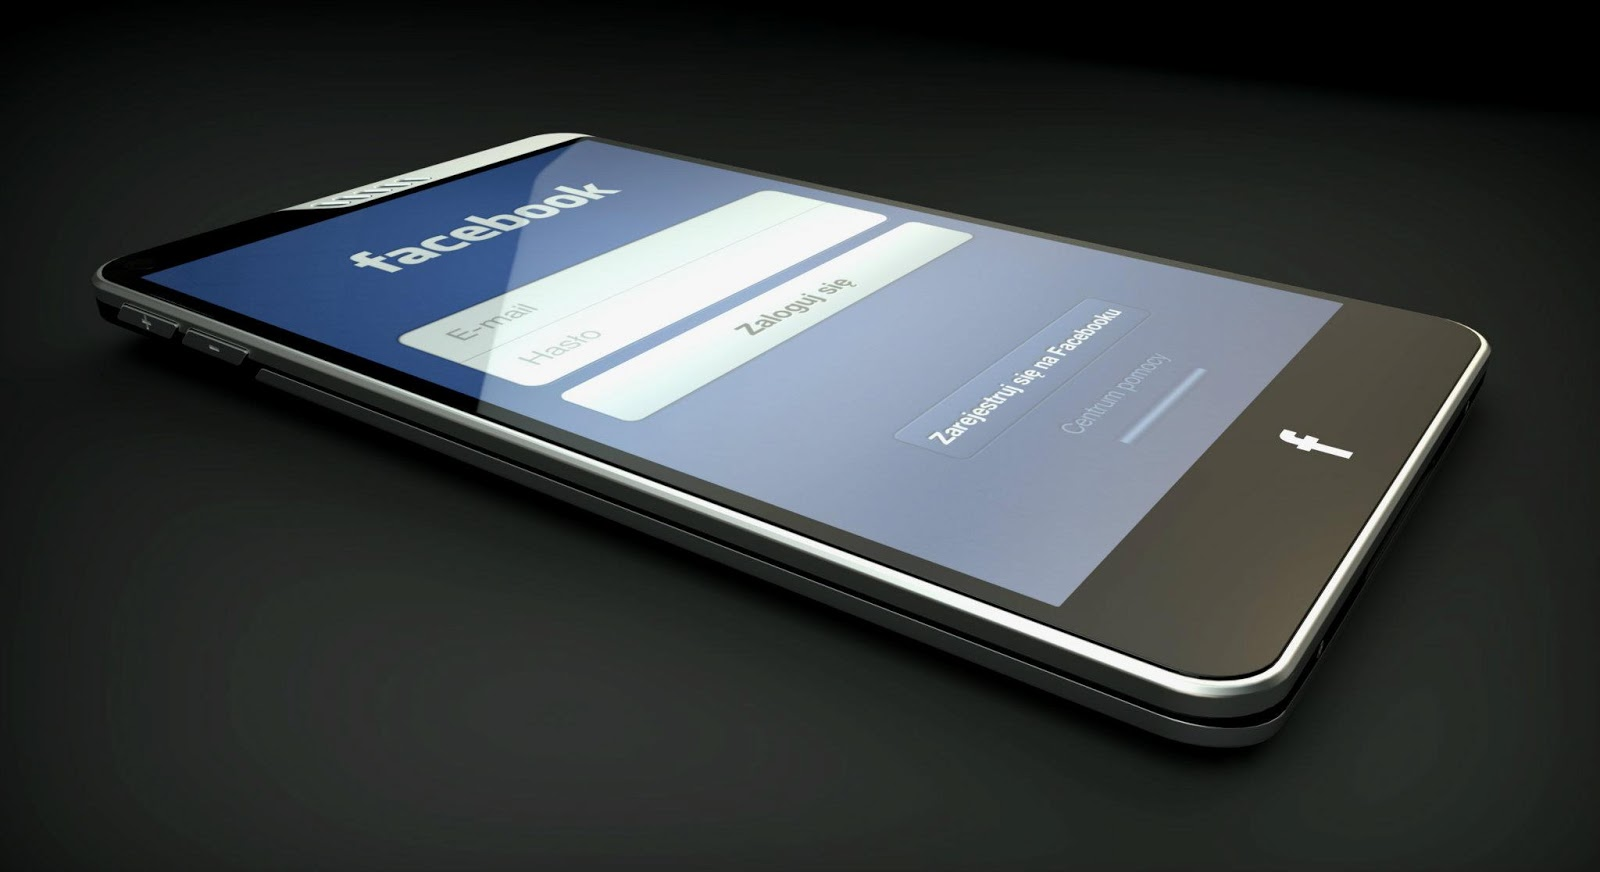 facebook phone, mockup